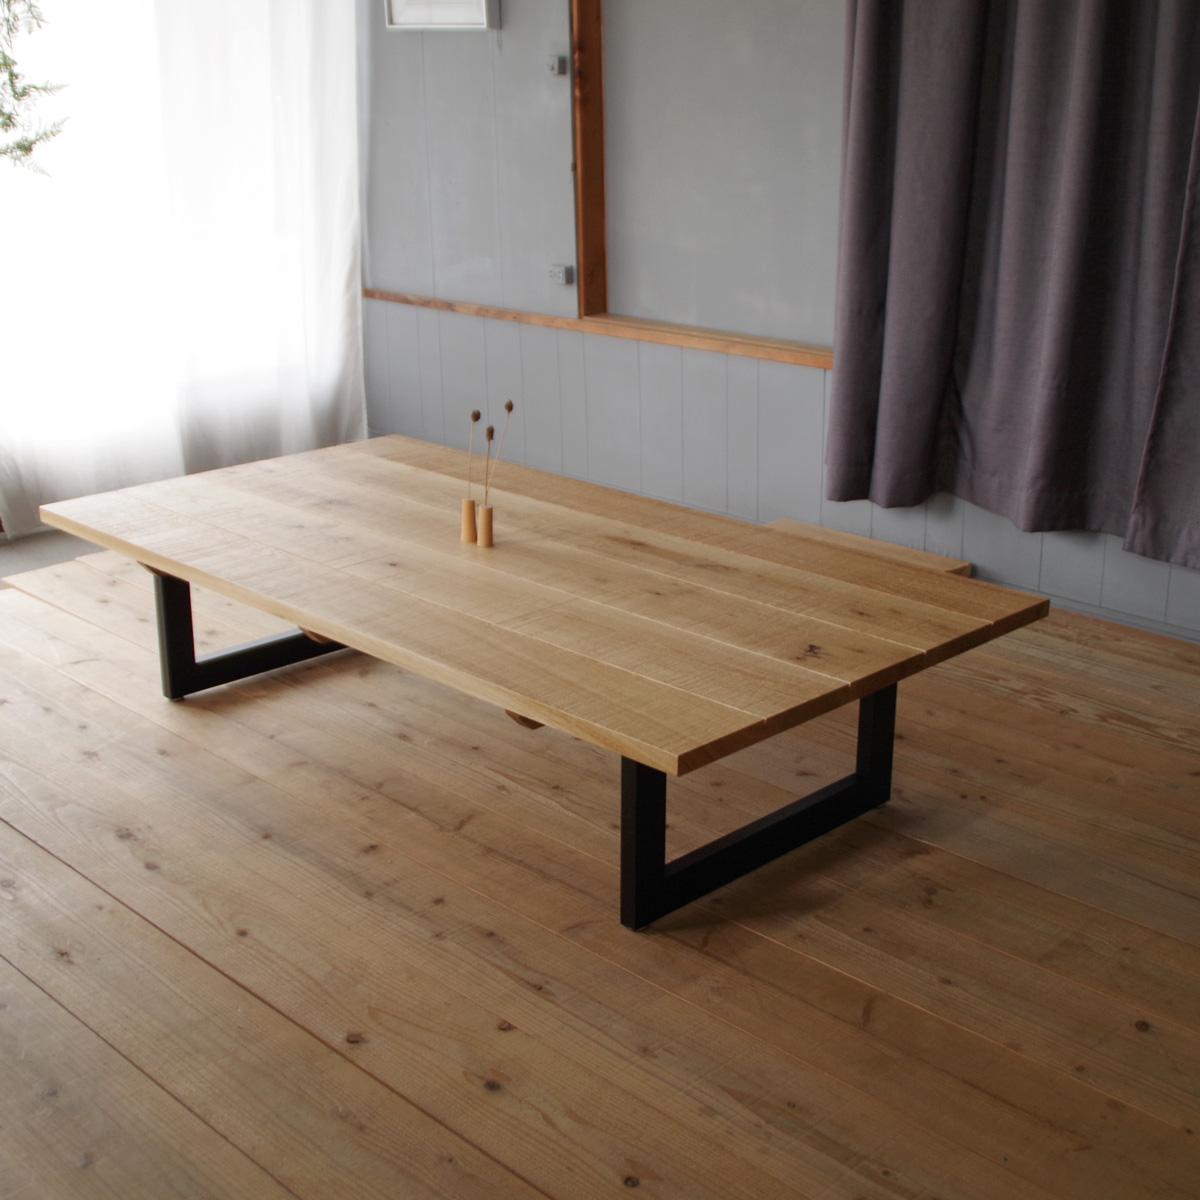 LT-Origin - nara座卓 160×85 長方形 ナラ節入無垢材 アイアン脚|北欧|和風|モダン|シンプル|デザイン||おしゃれ||日本製|リビングテーブル|国産リビングテーブル||センターテーブル|ローテーブル|座卓|DIY|アイアン|男前|